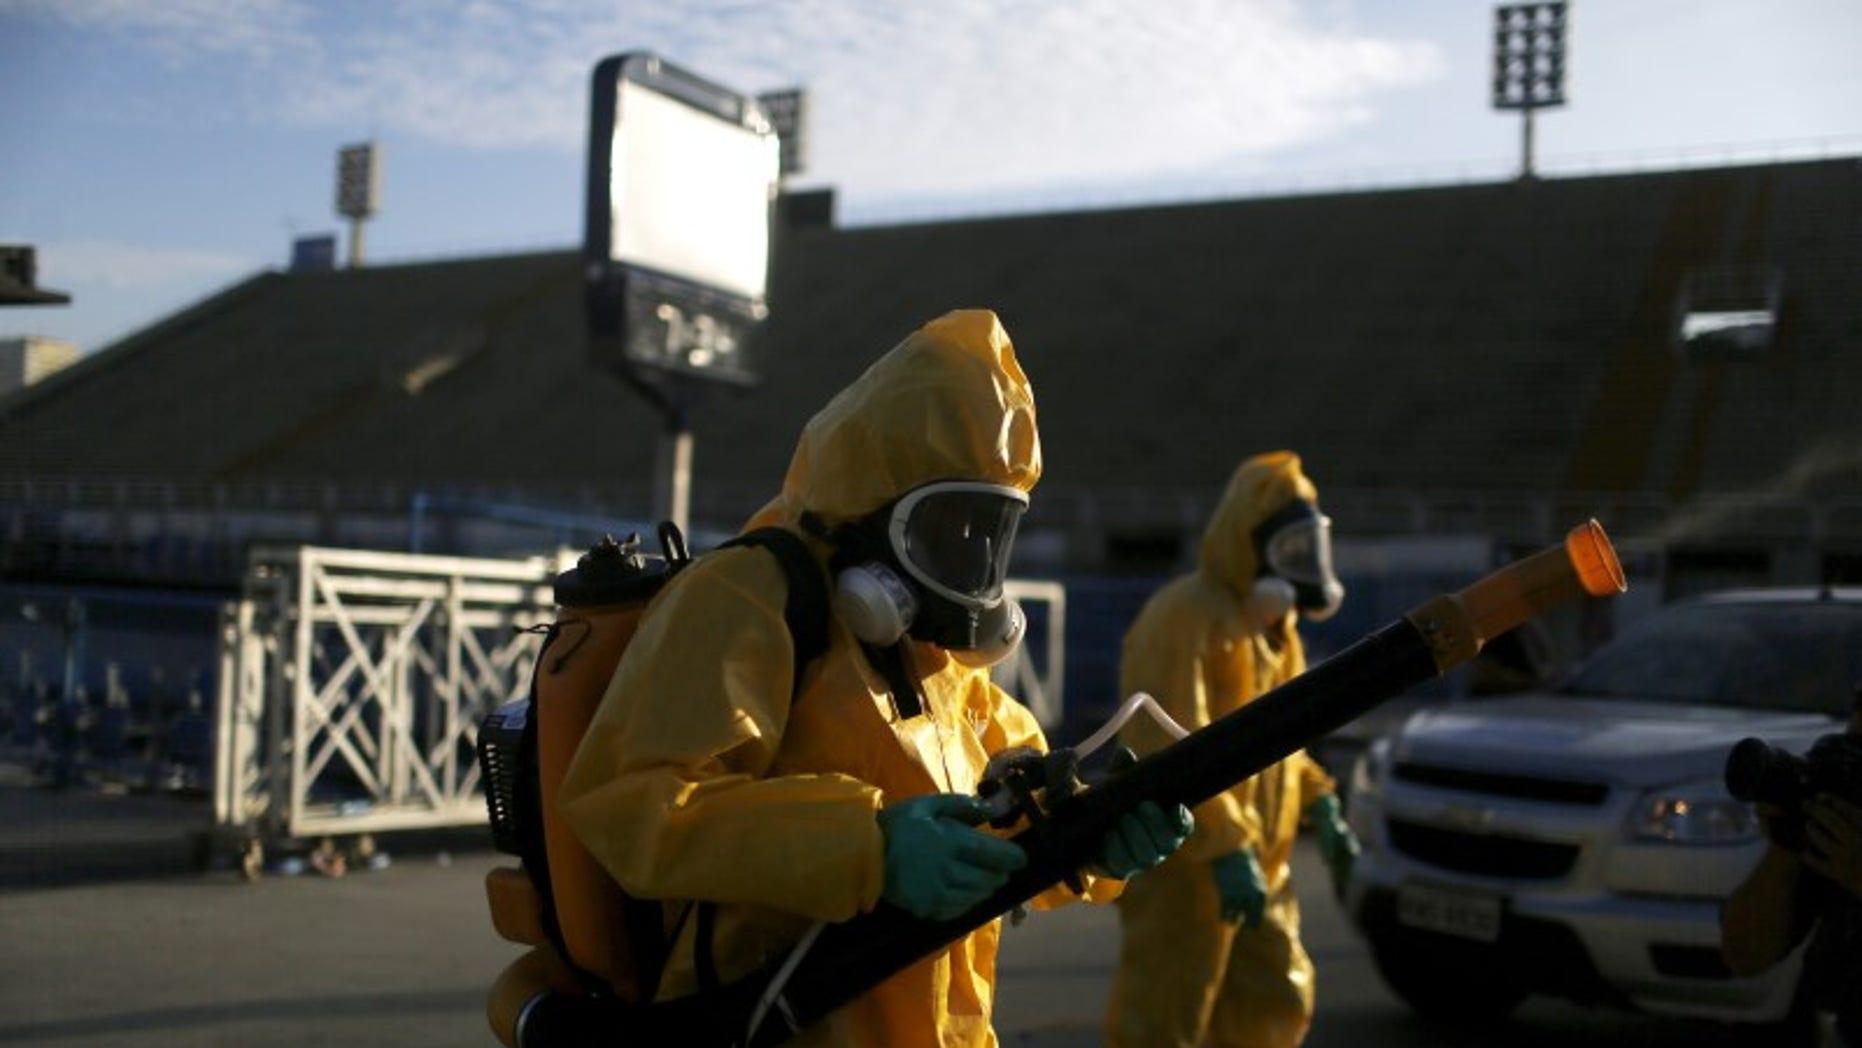 Municipal workers spray insecticide at Sambodrome in Rio de Janeiro